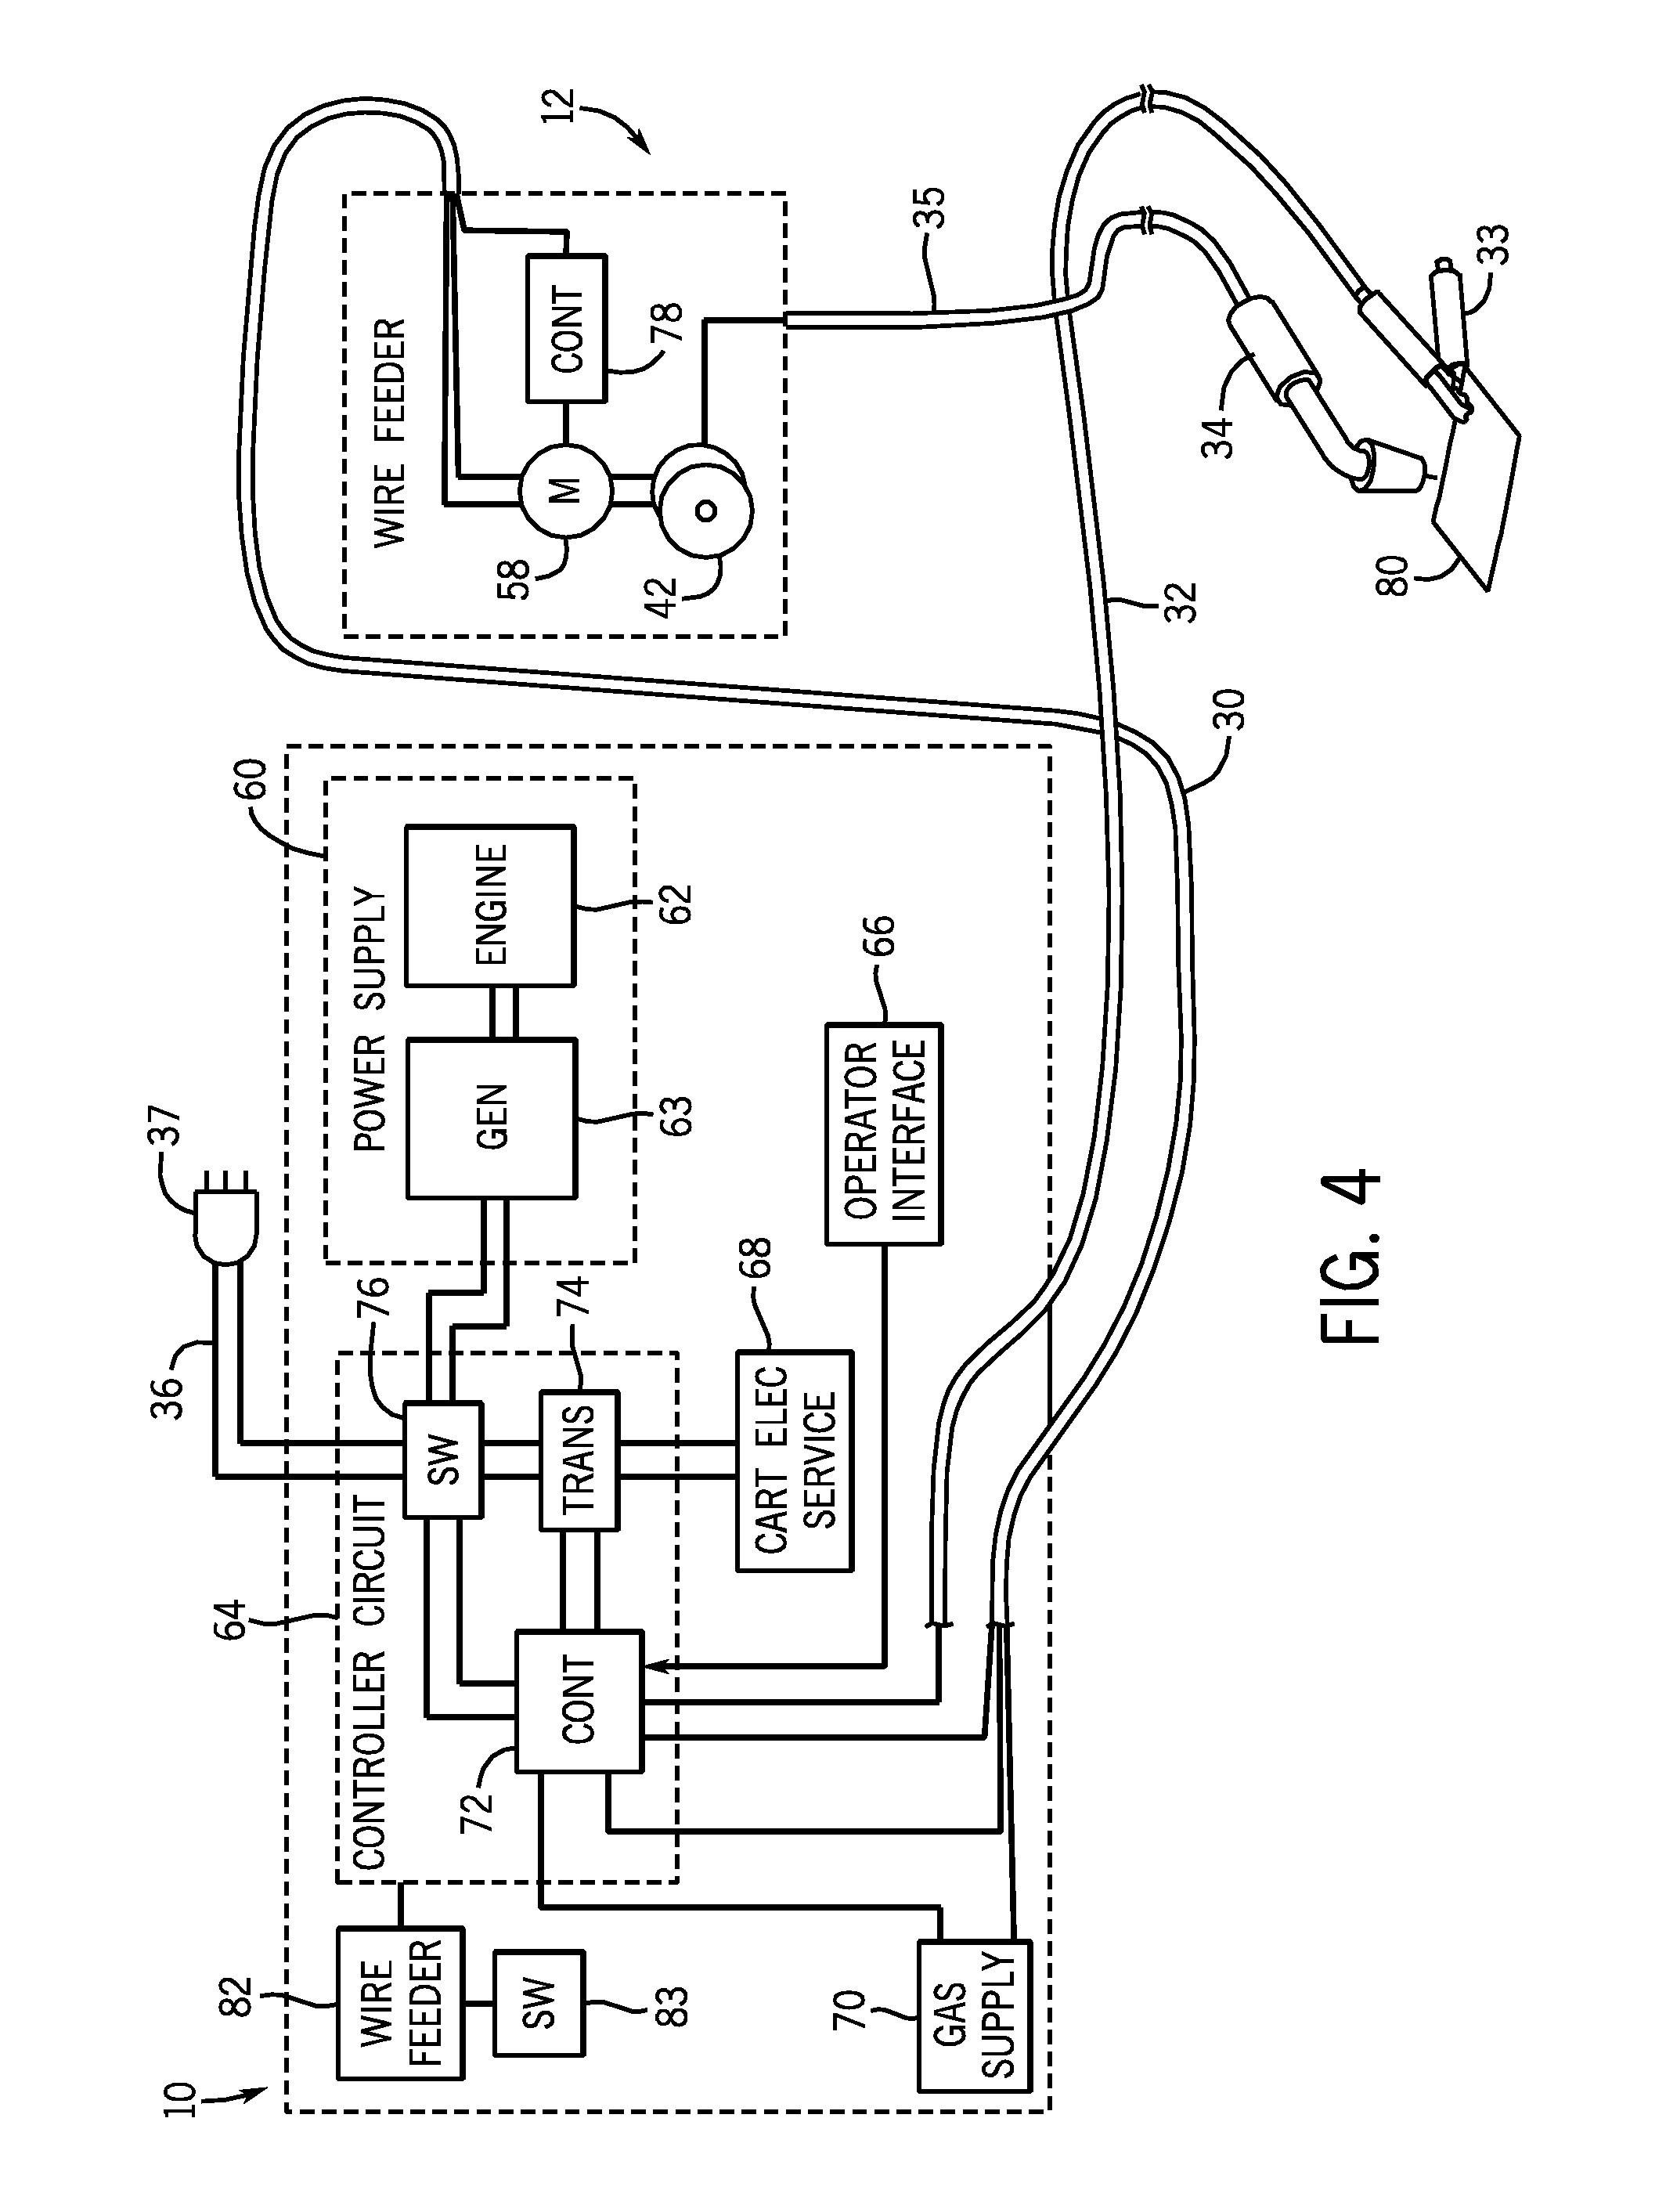 Welder Outlet Wiring Diagram